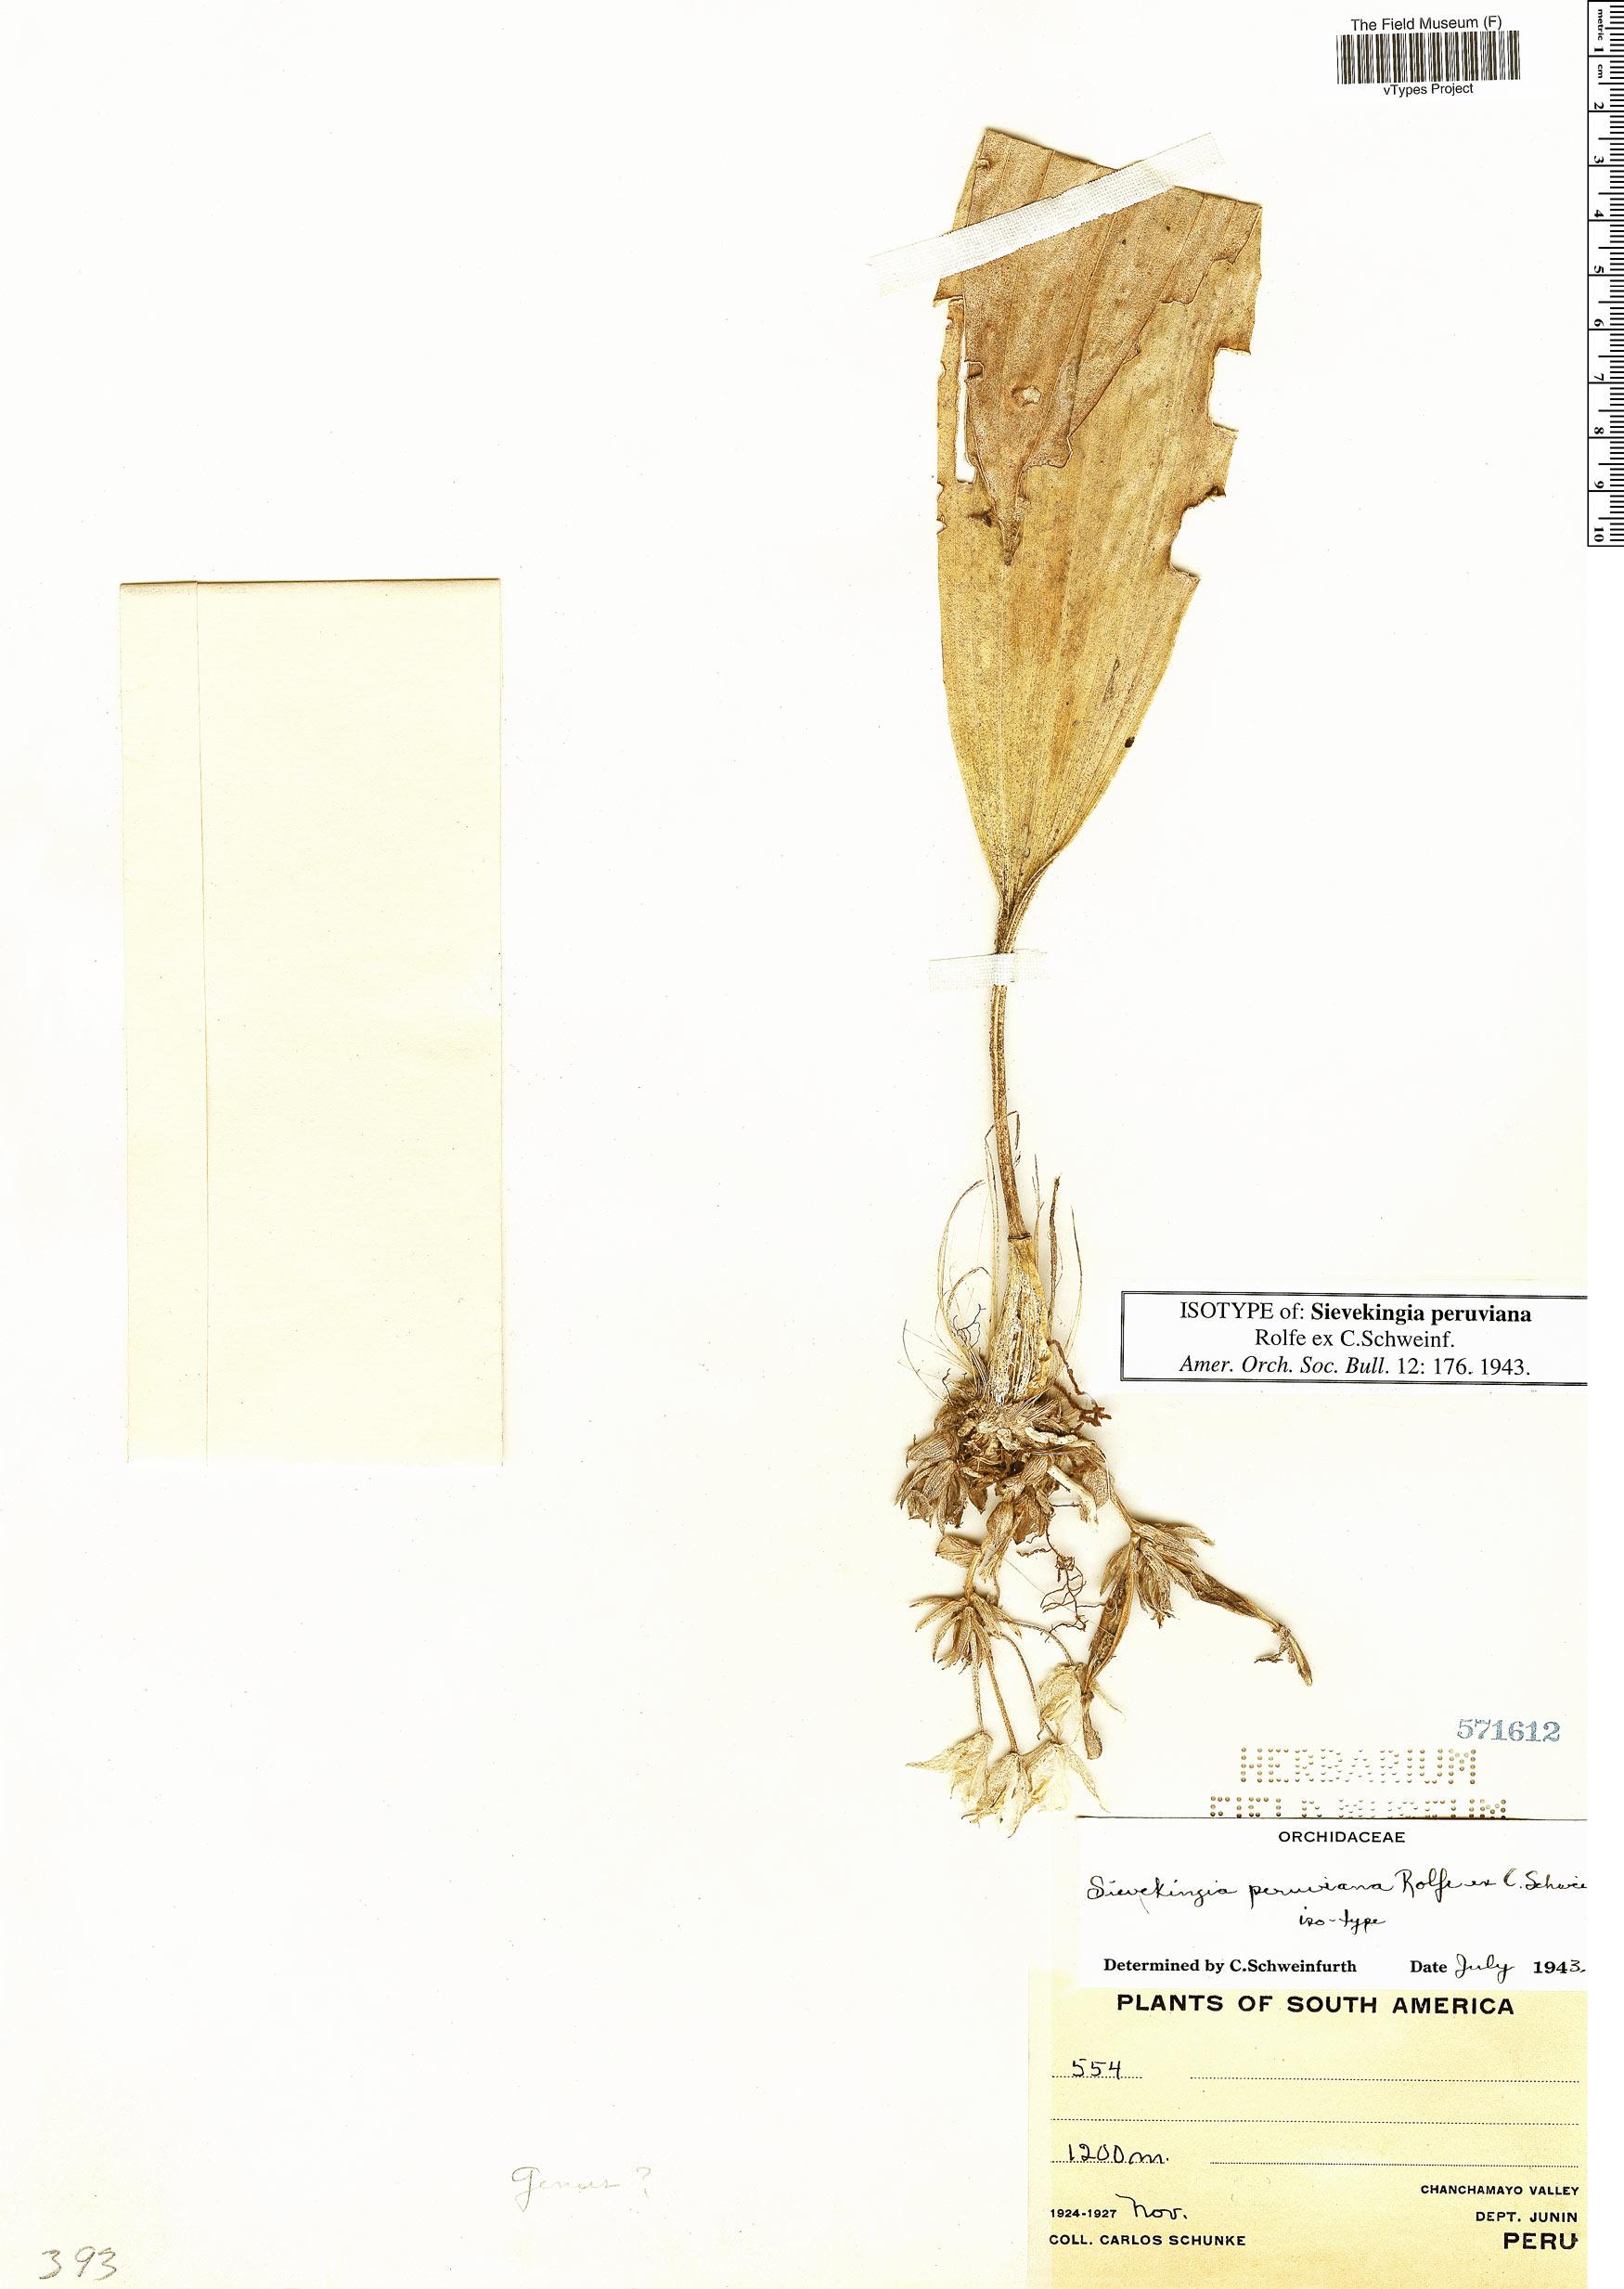 Specimen: Sievekingia peruviana